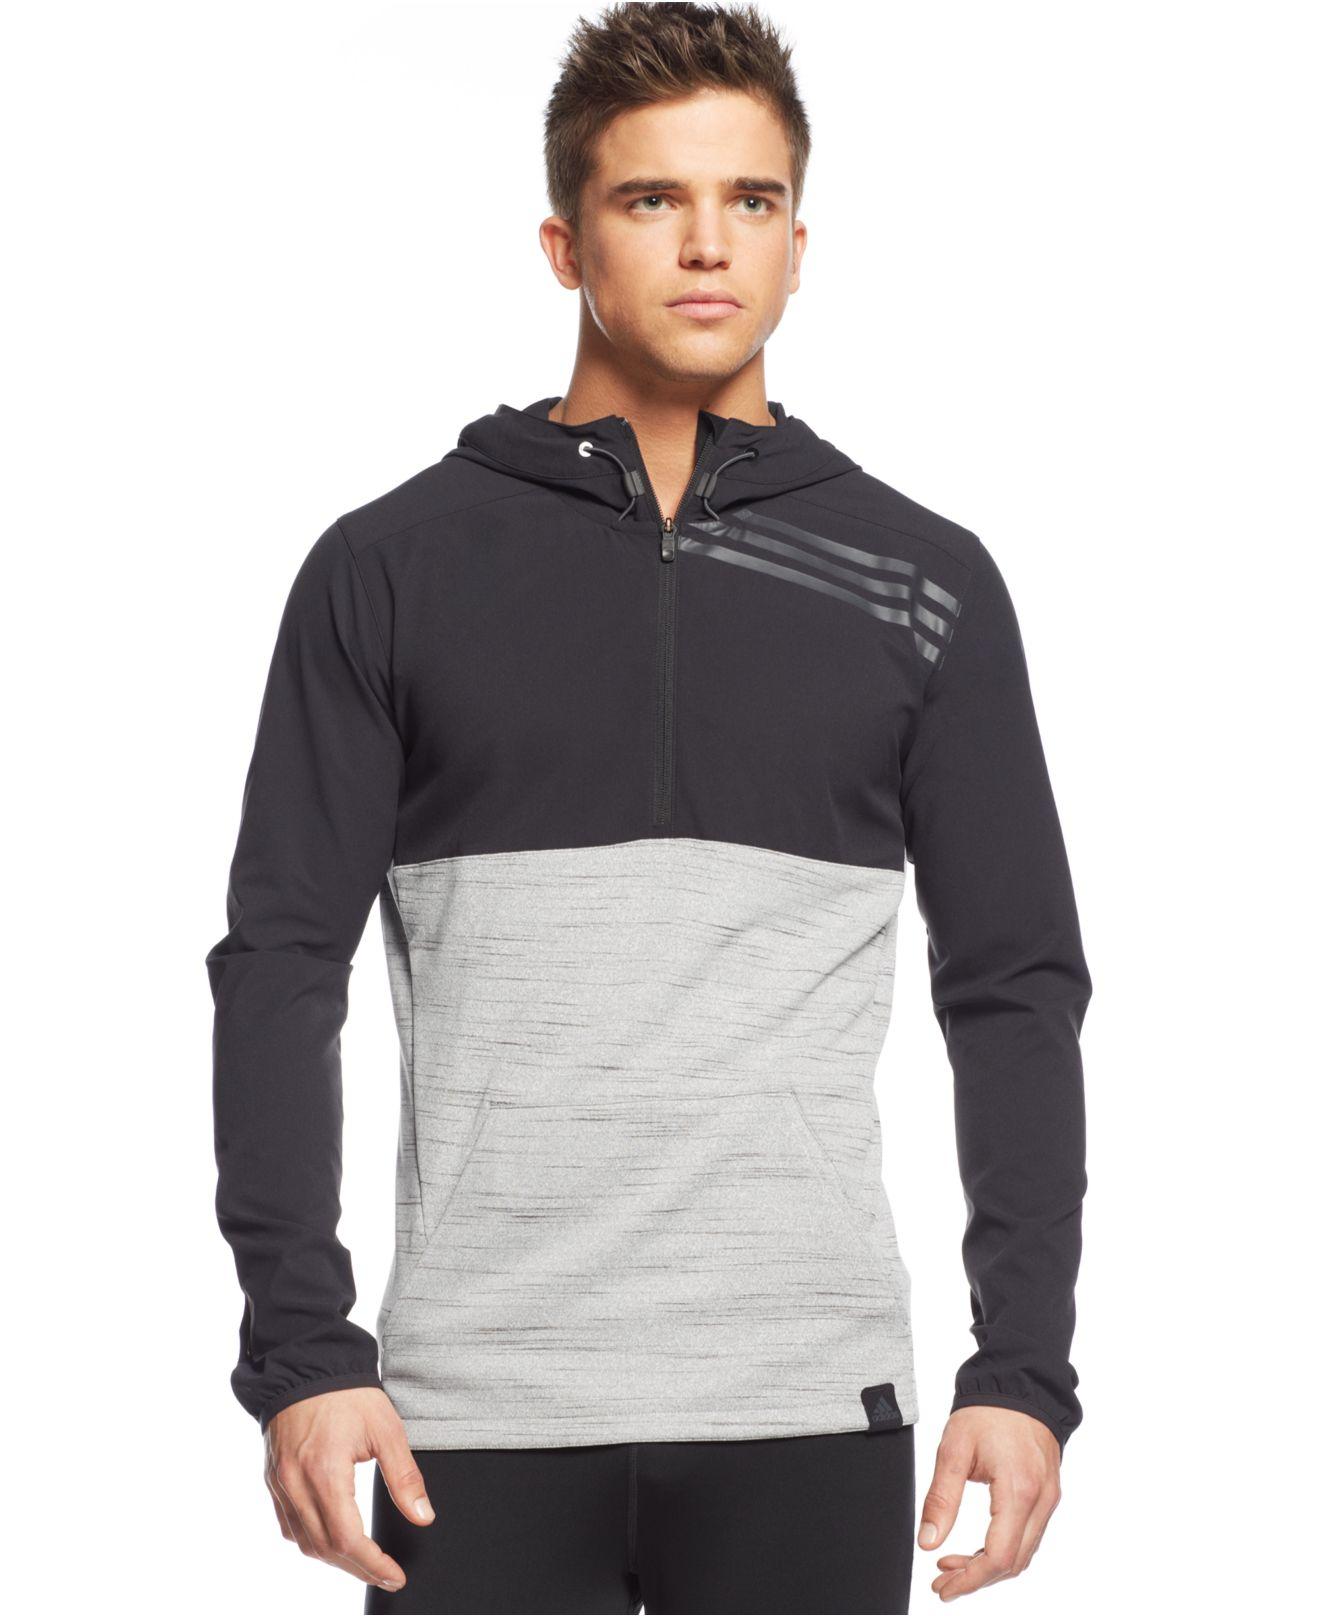 Mens Hoodies amp Sweatshirts  adidas Nike amp Champion